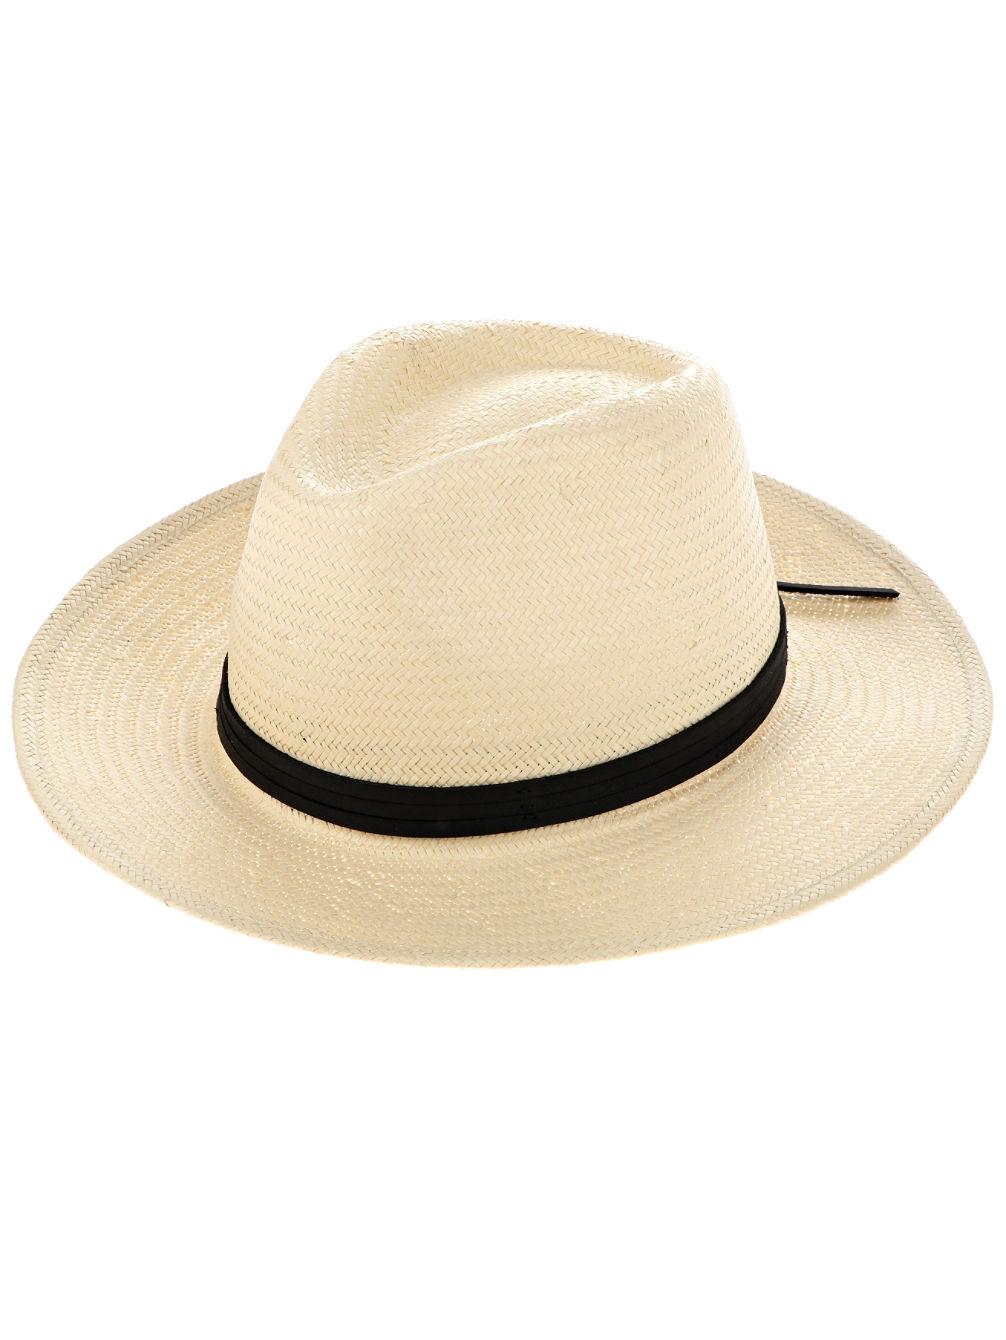 brixton-pacific-fedora-hat